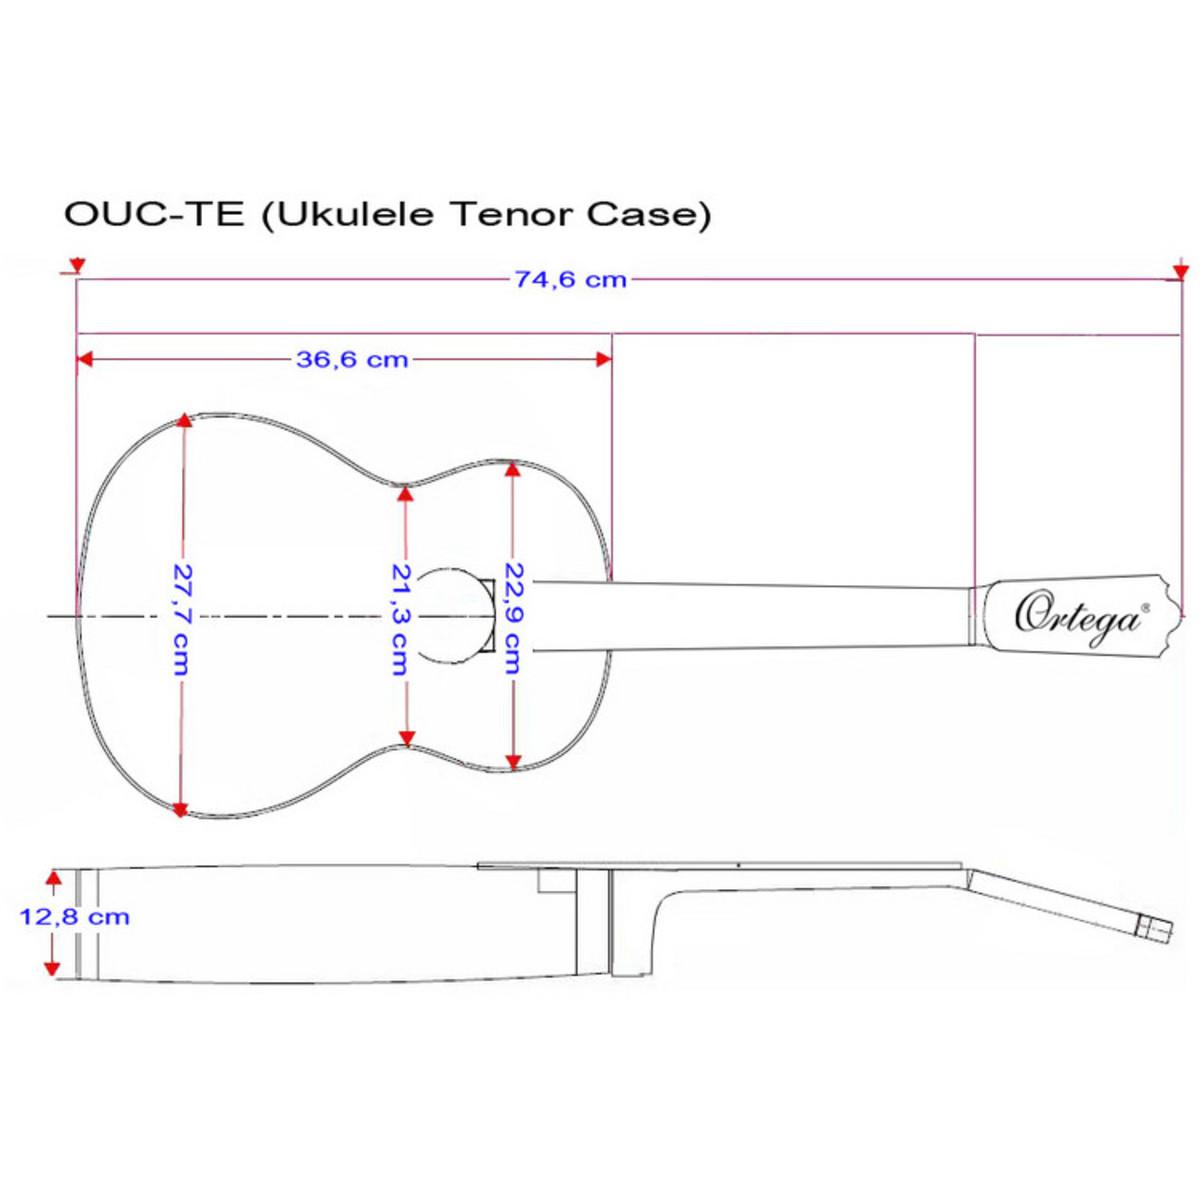 Ortega Ouc Te Professional Ukulele Case Tenor Size At